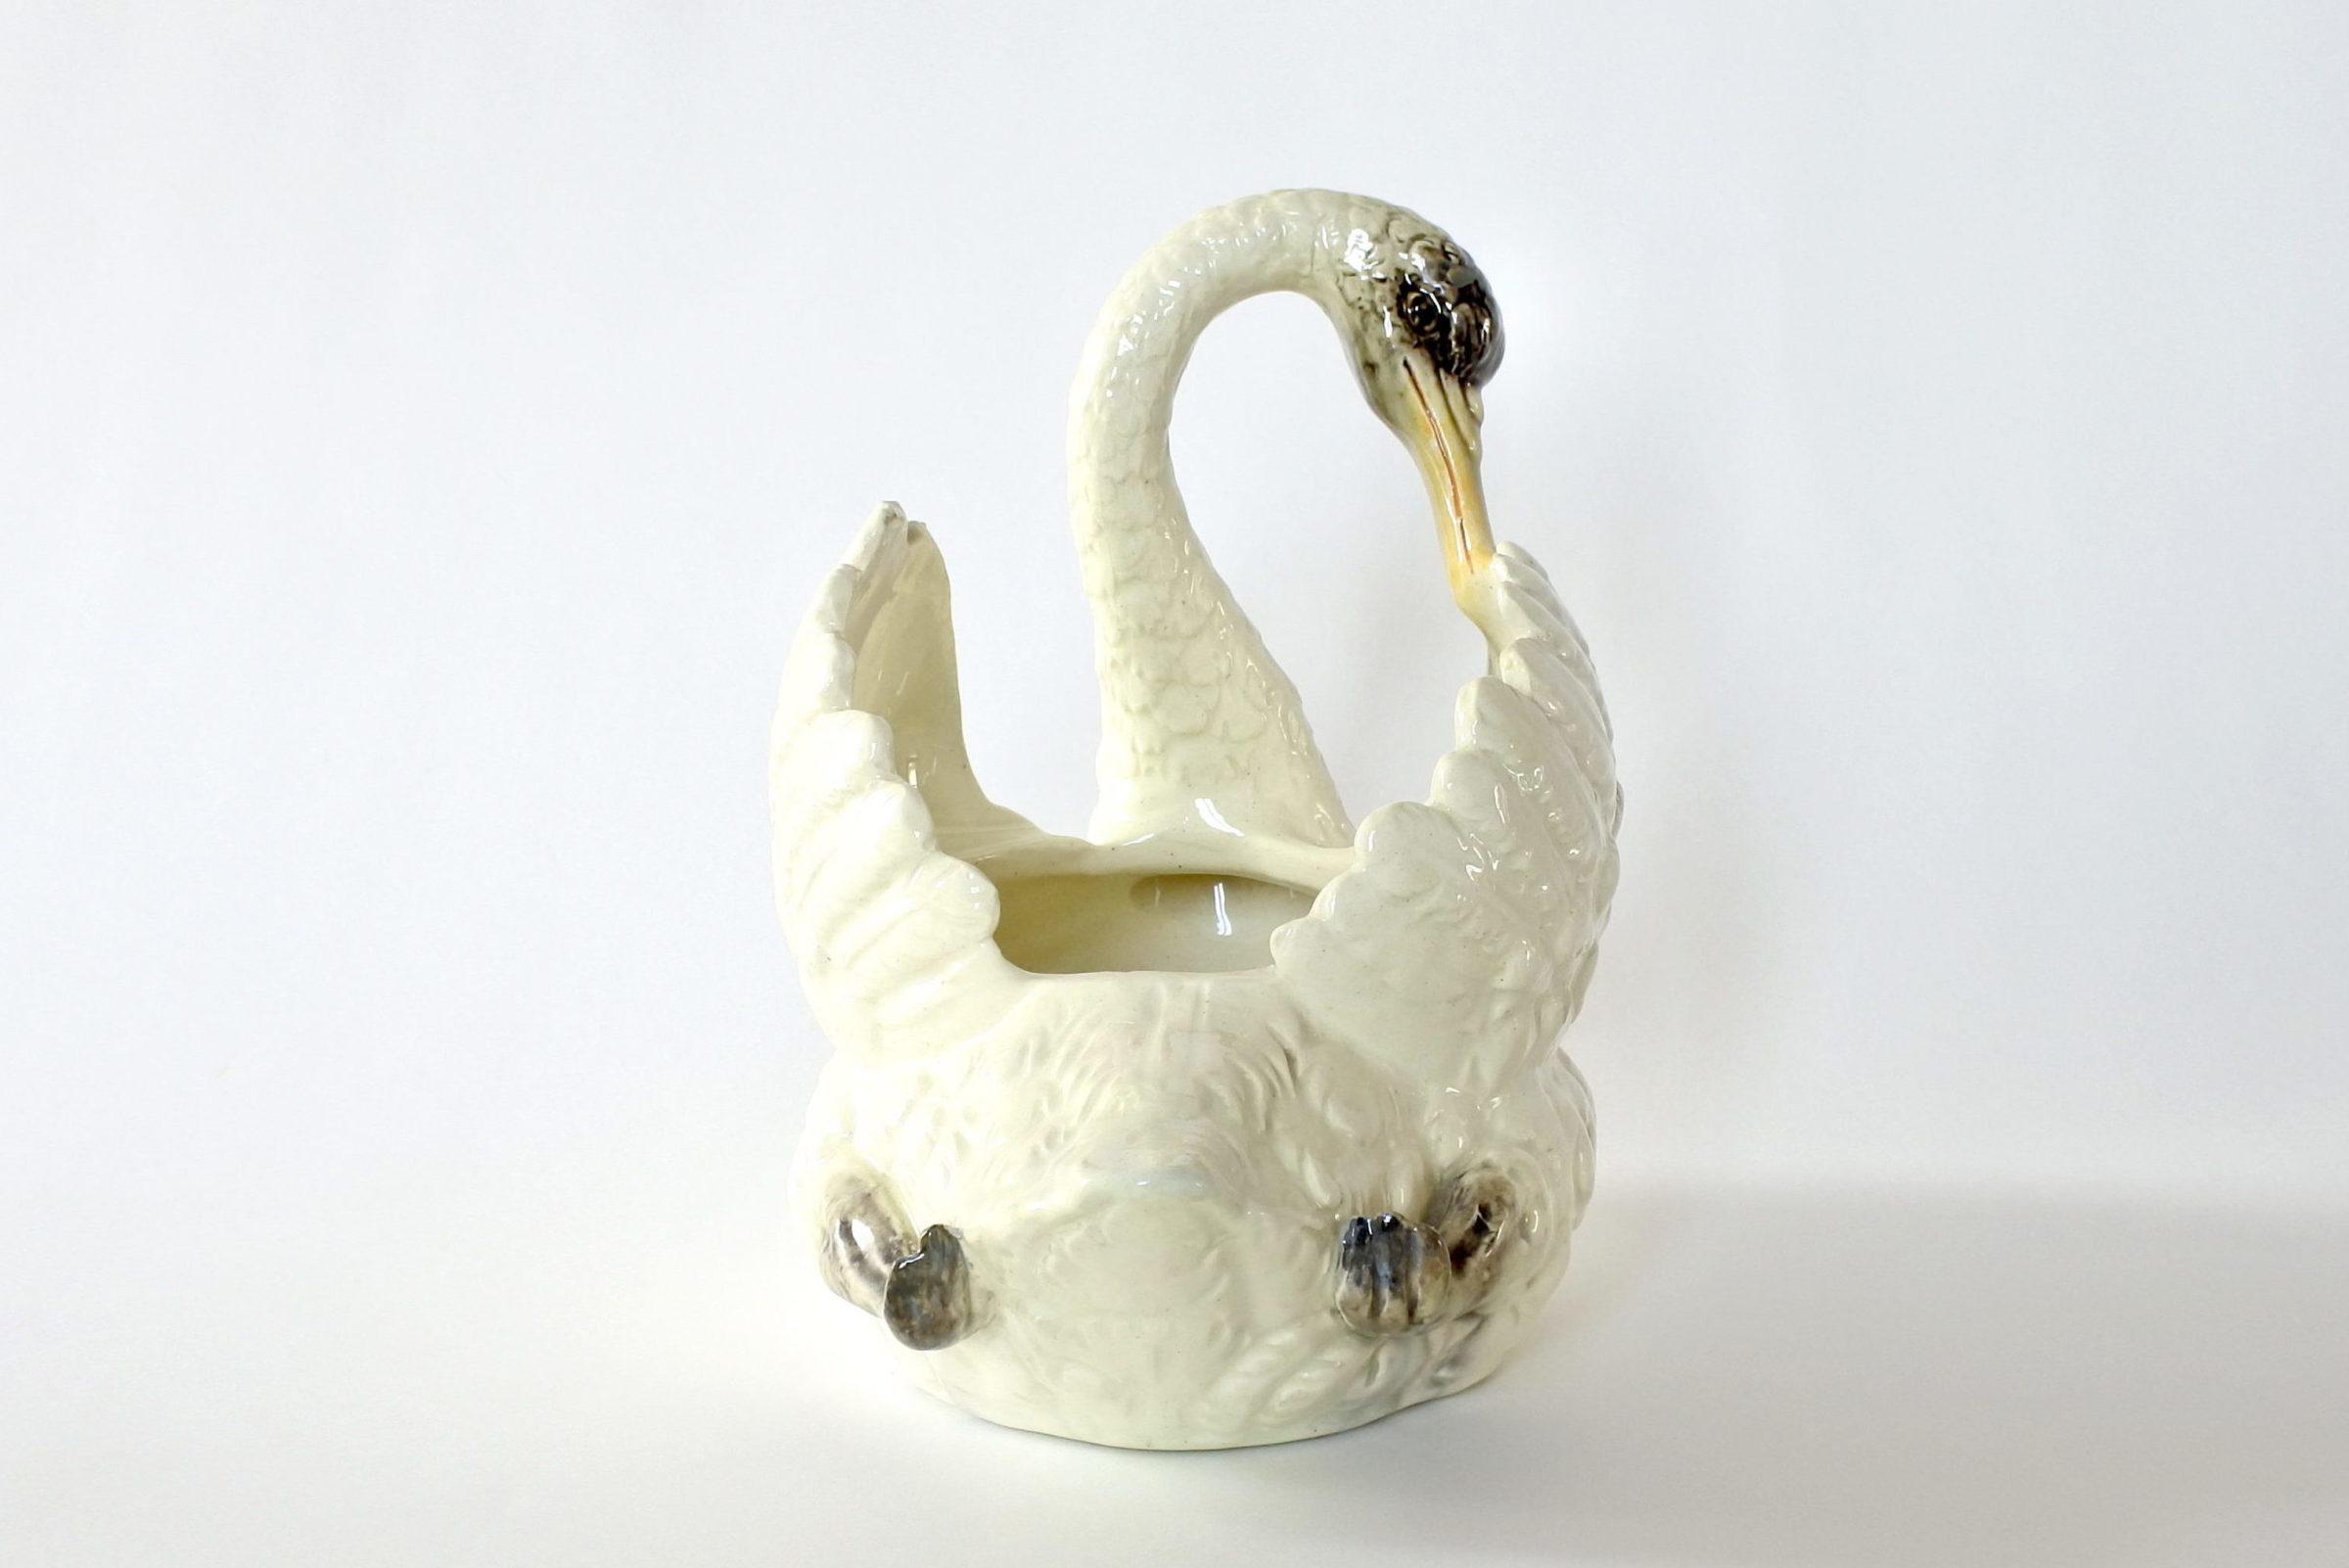 Cigno in ceramica barbotine con funzione di jardinière - Jérôme Massier Fils - 4